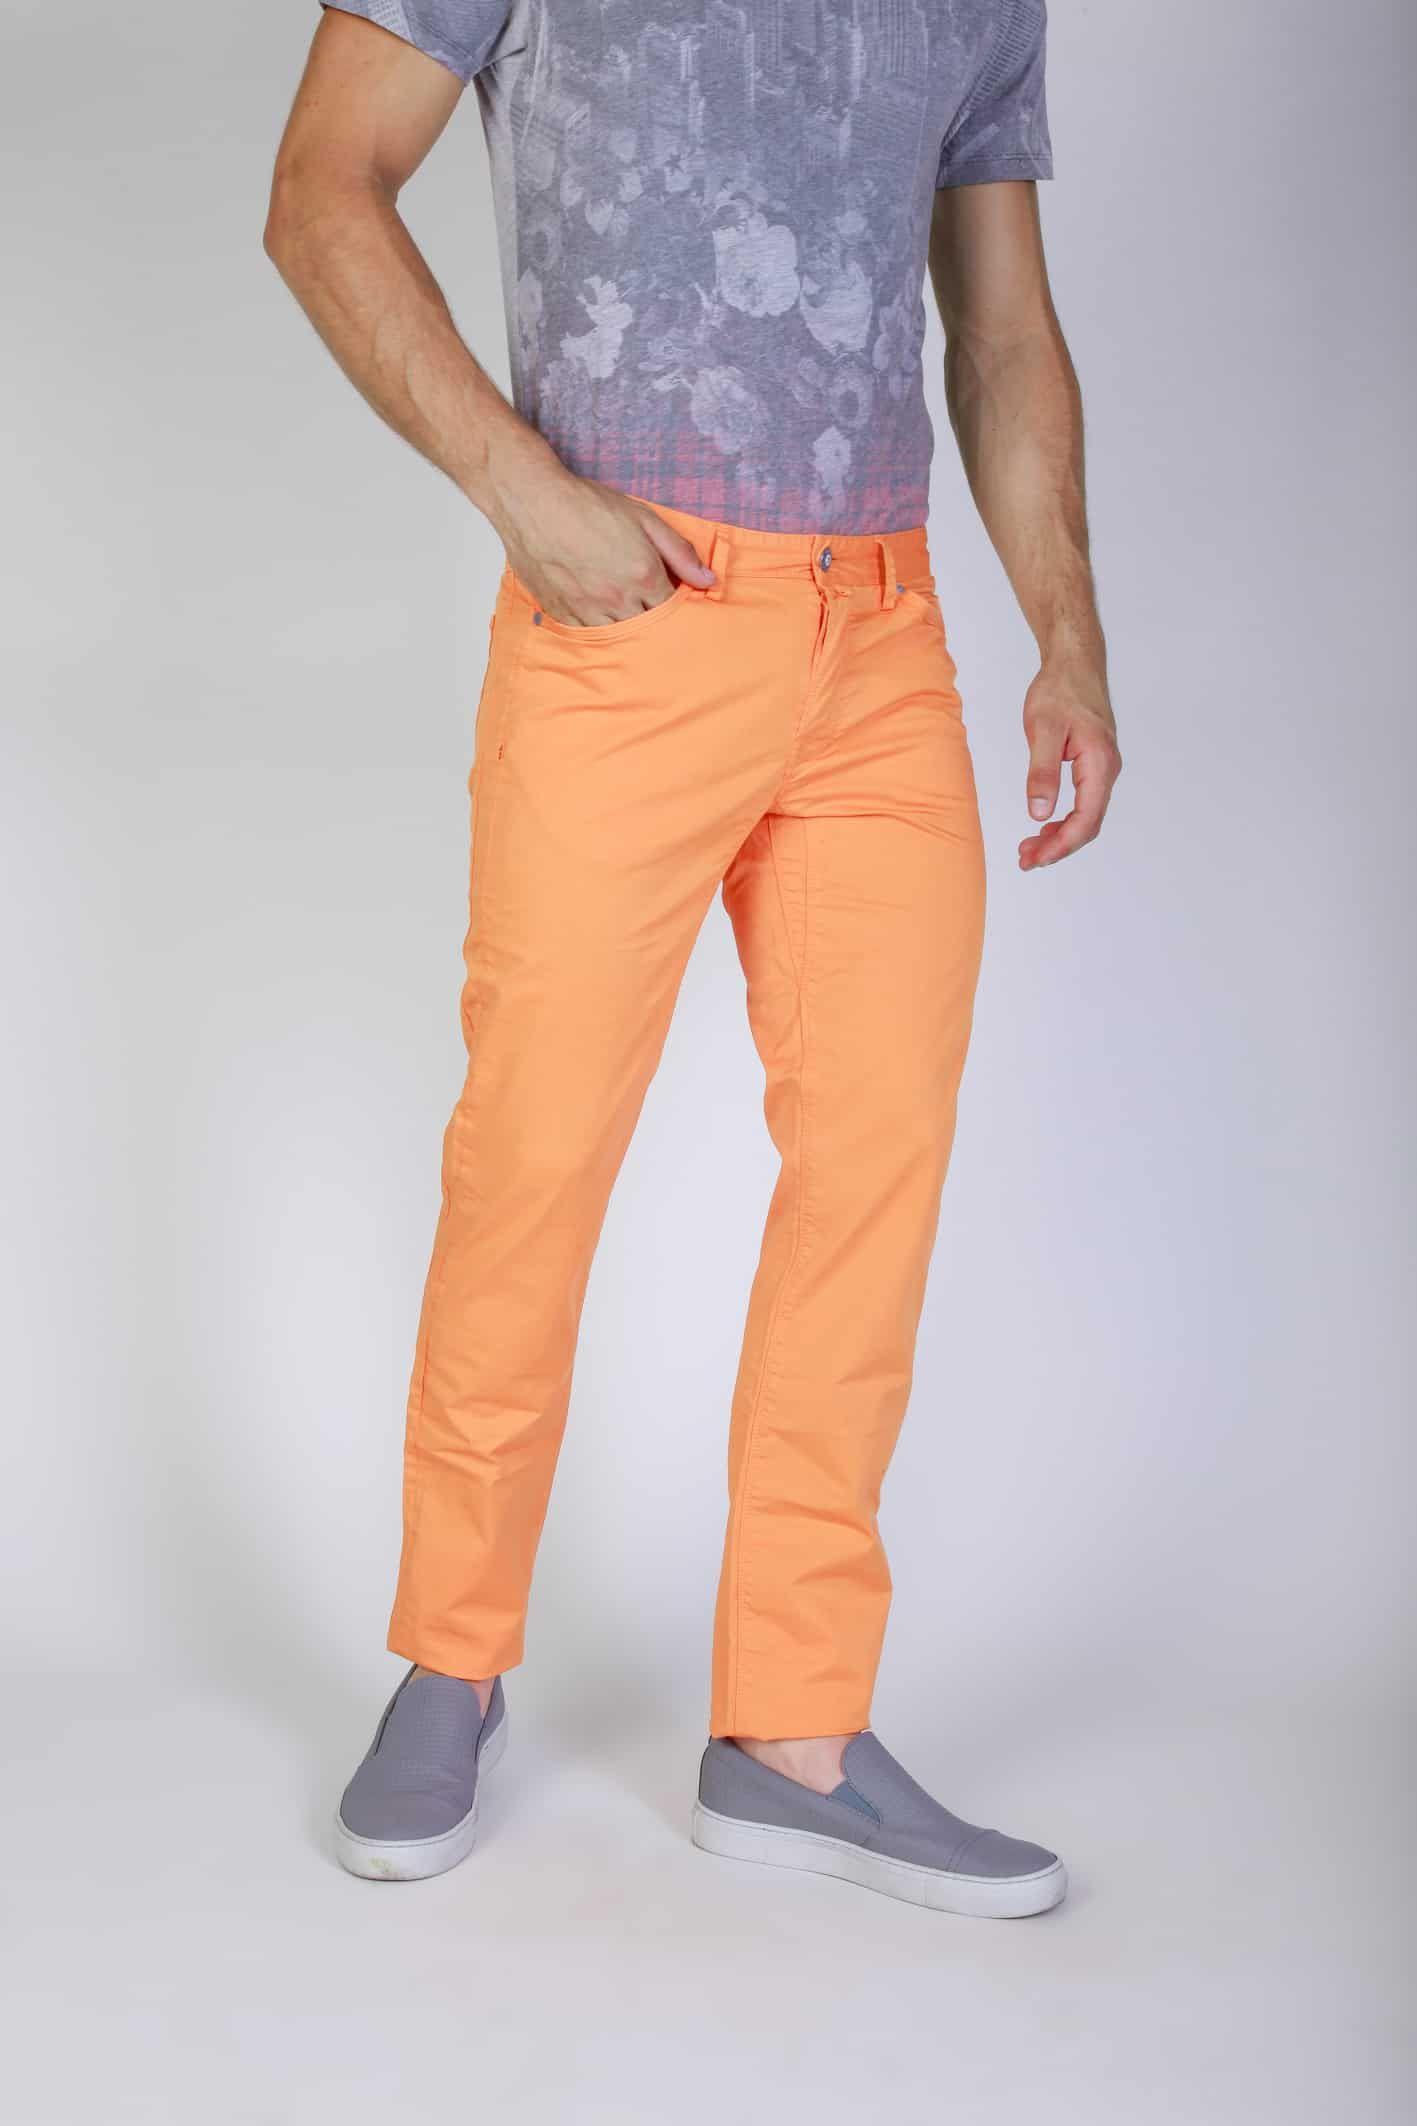 Jaggy – J1883T812-Q1 – Arancione